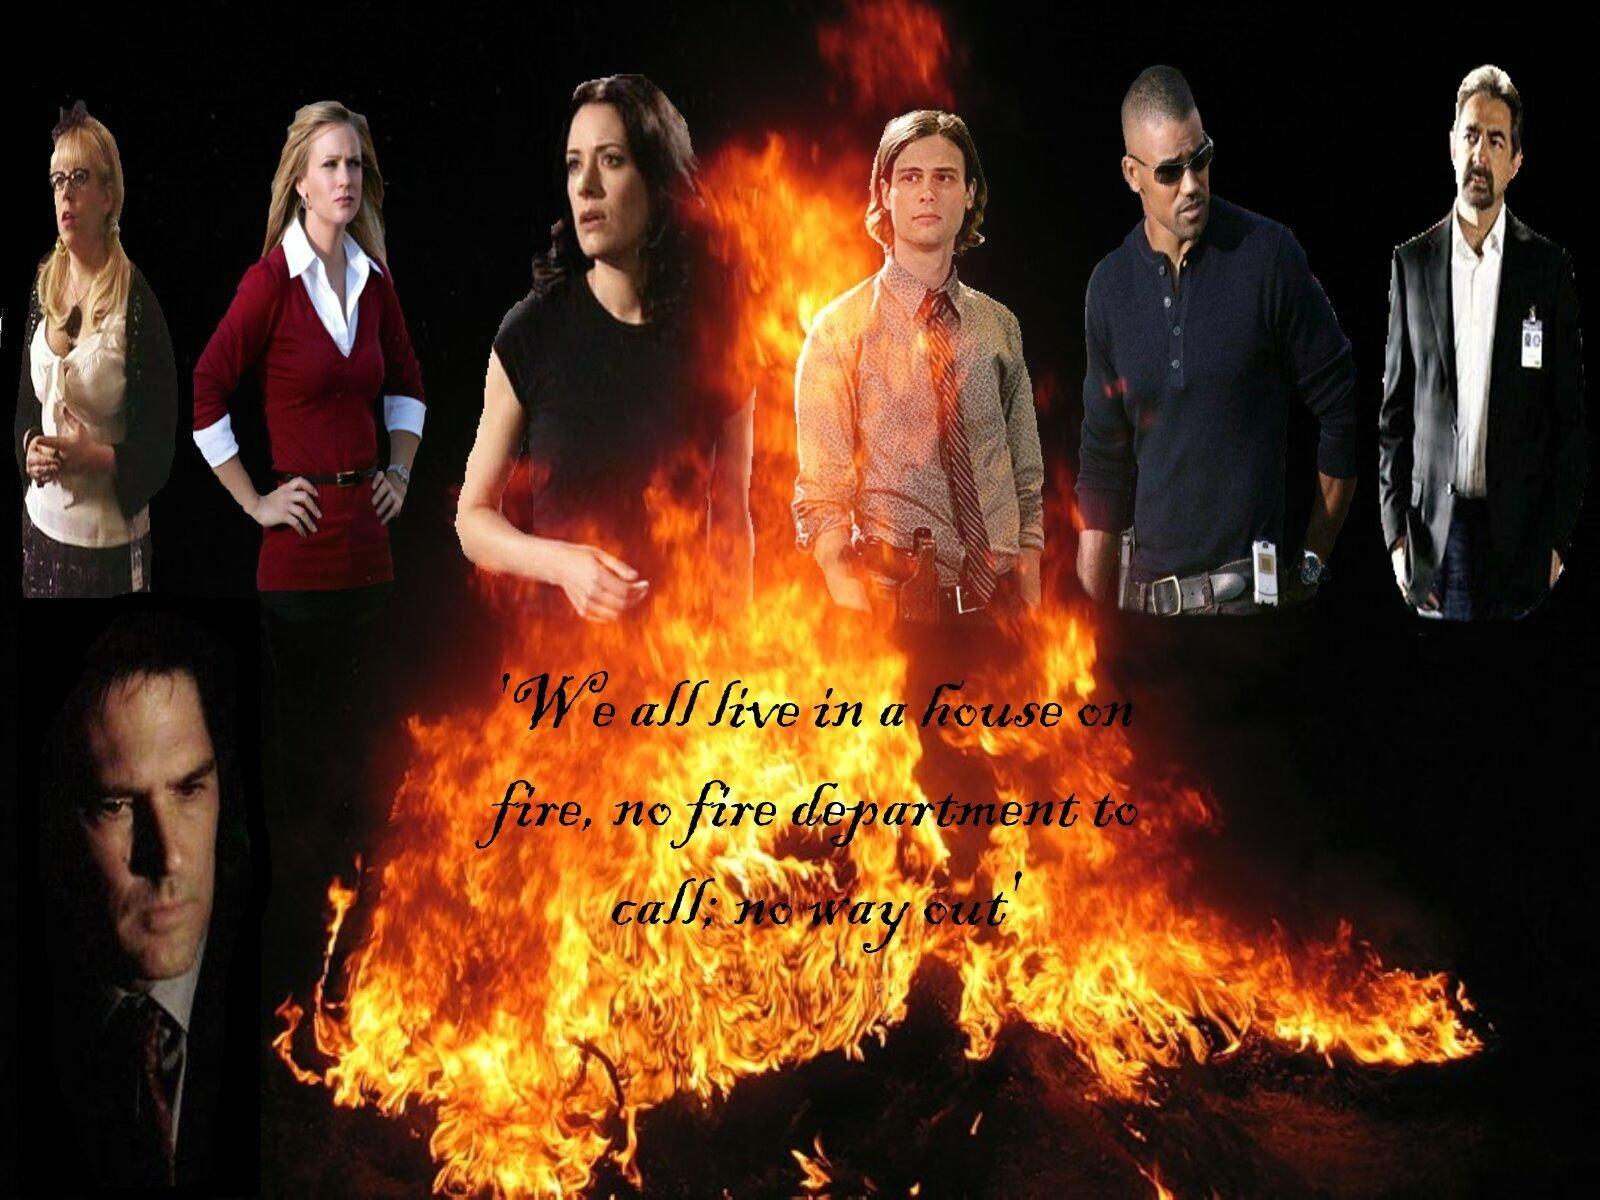 House on ngọn lửa, chữa cháy